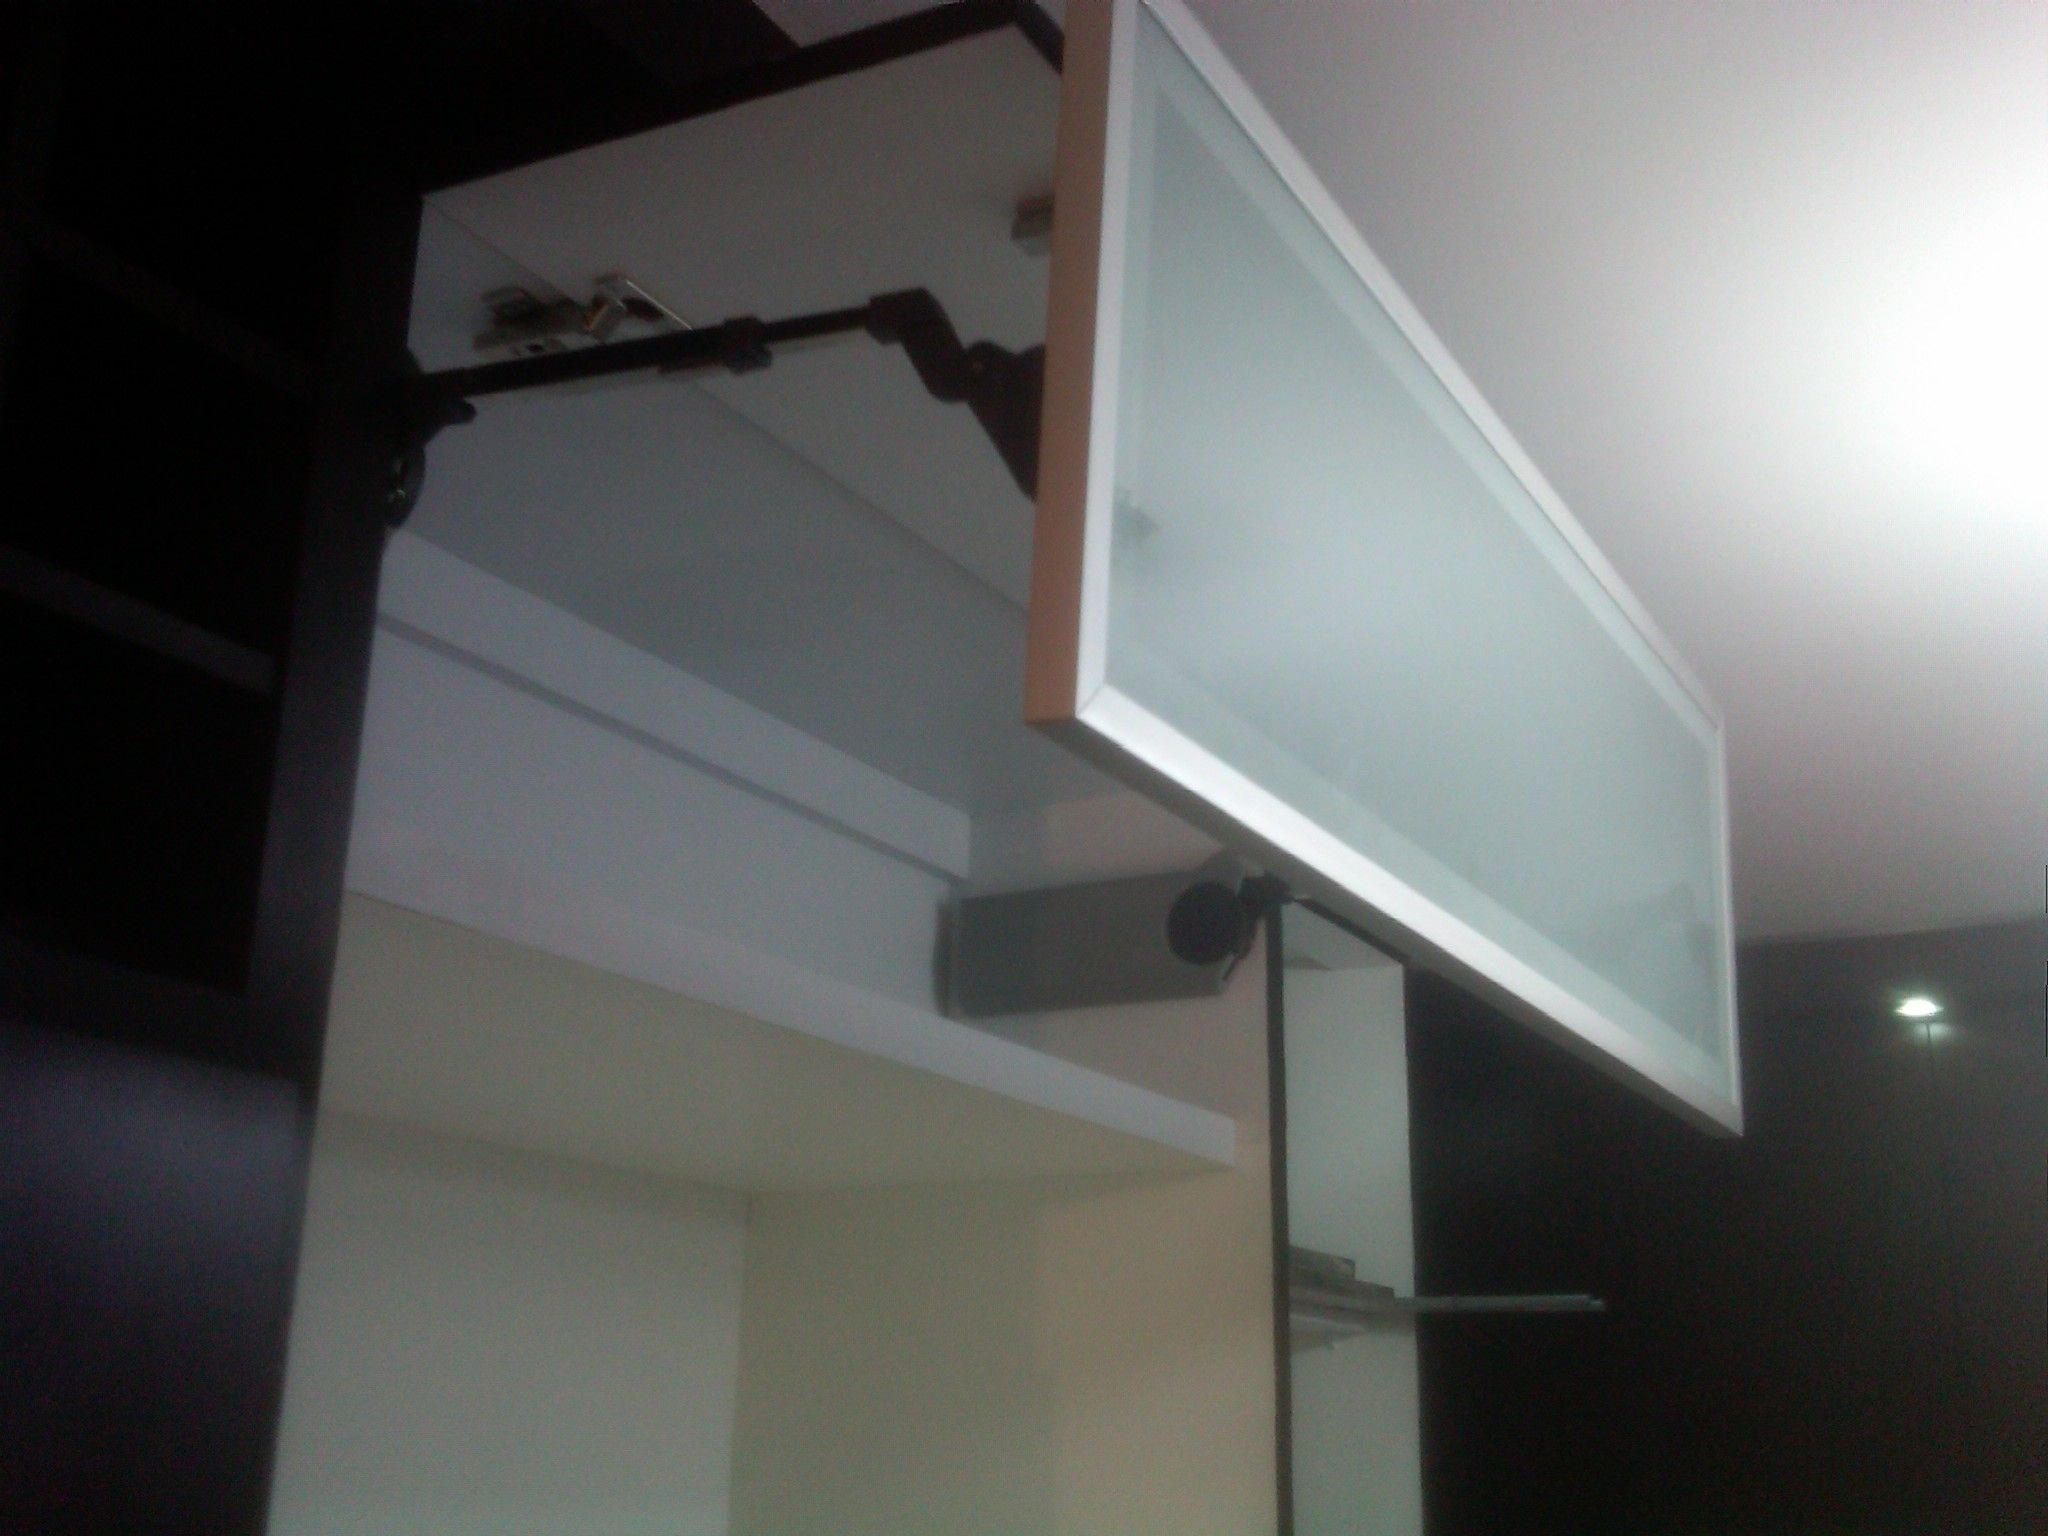 Gabinete aéreo con Avento Blum HF, cocina color Wengué con perfil de ...